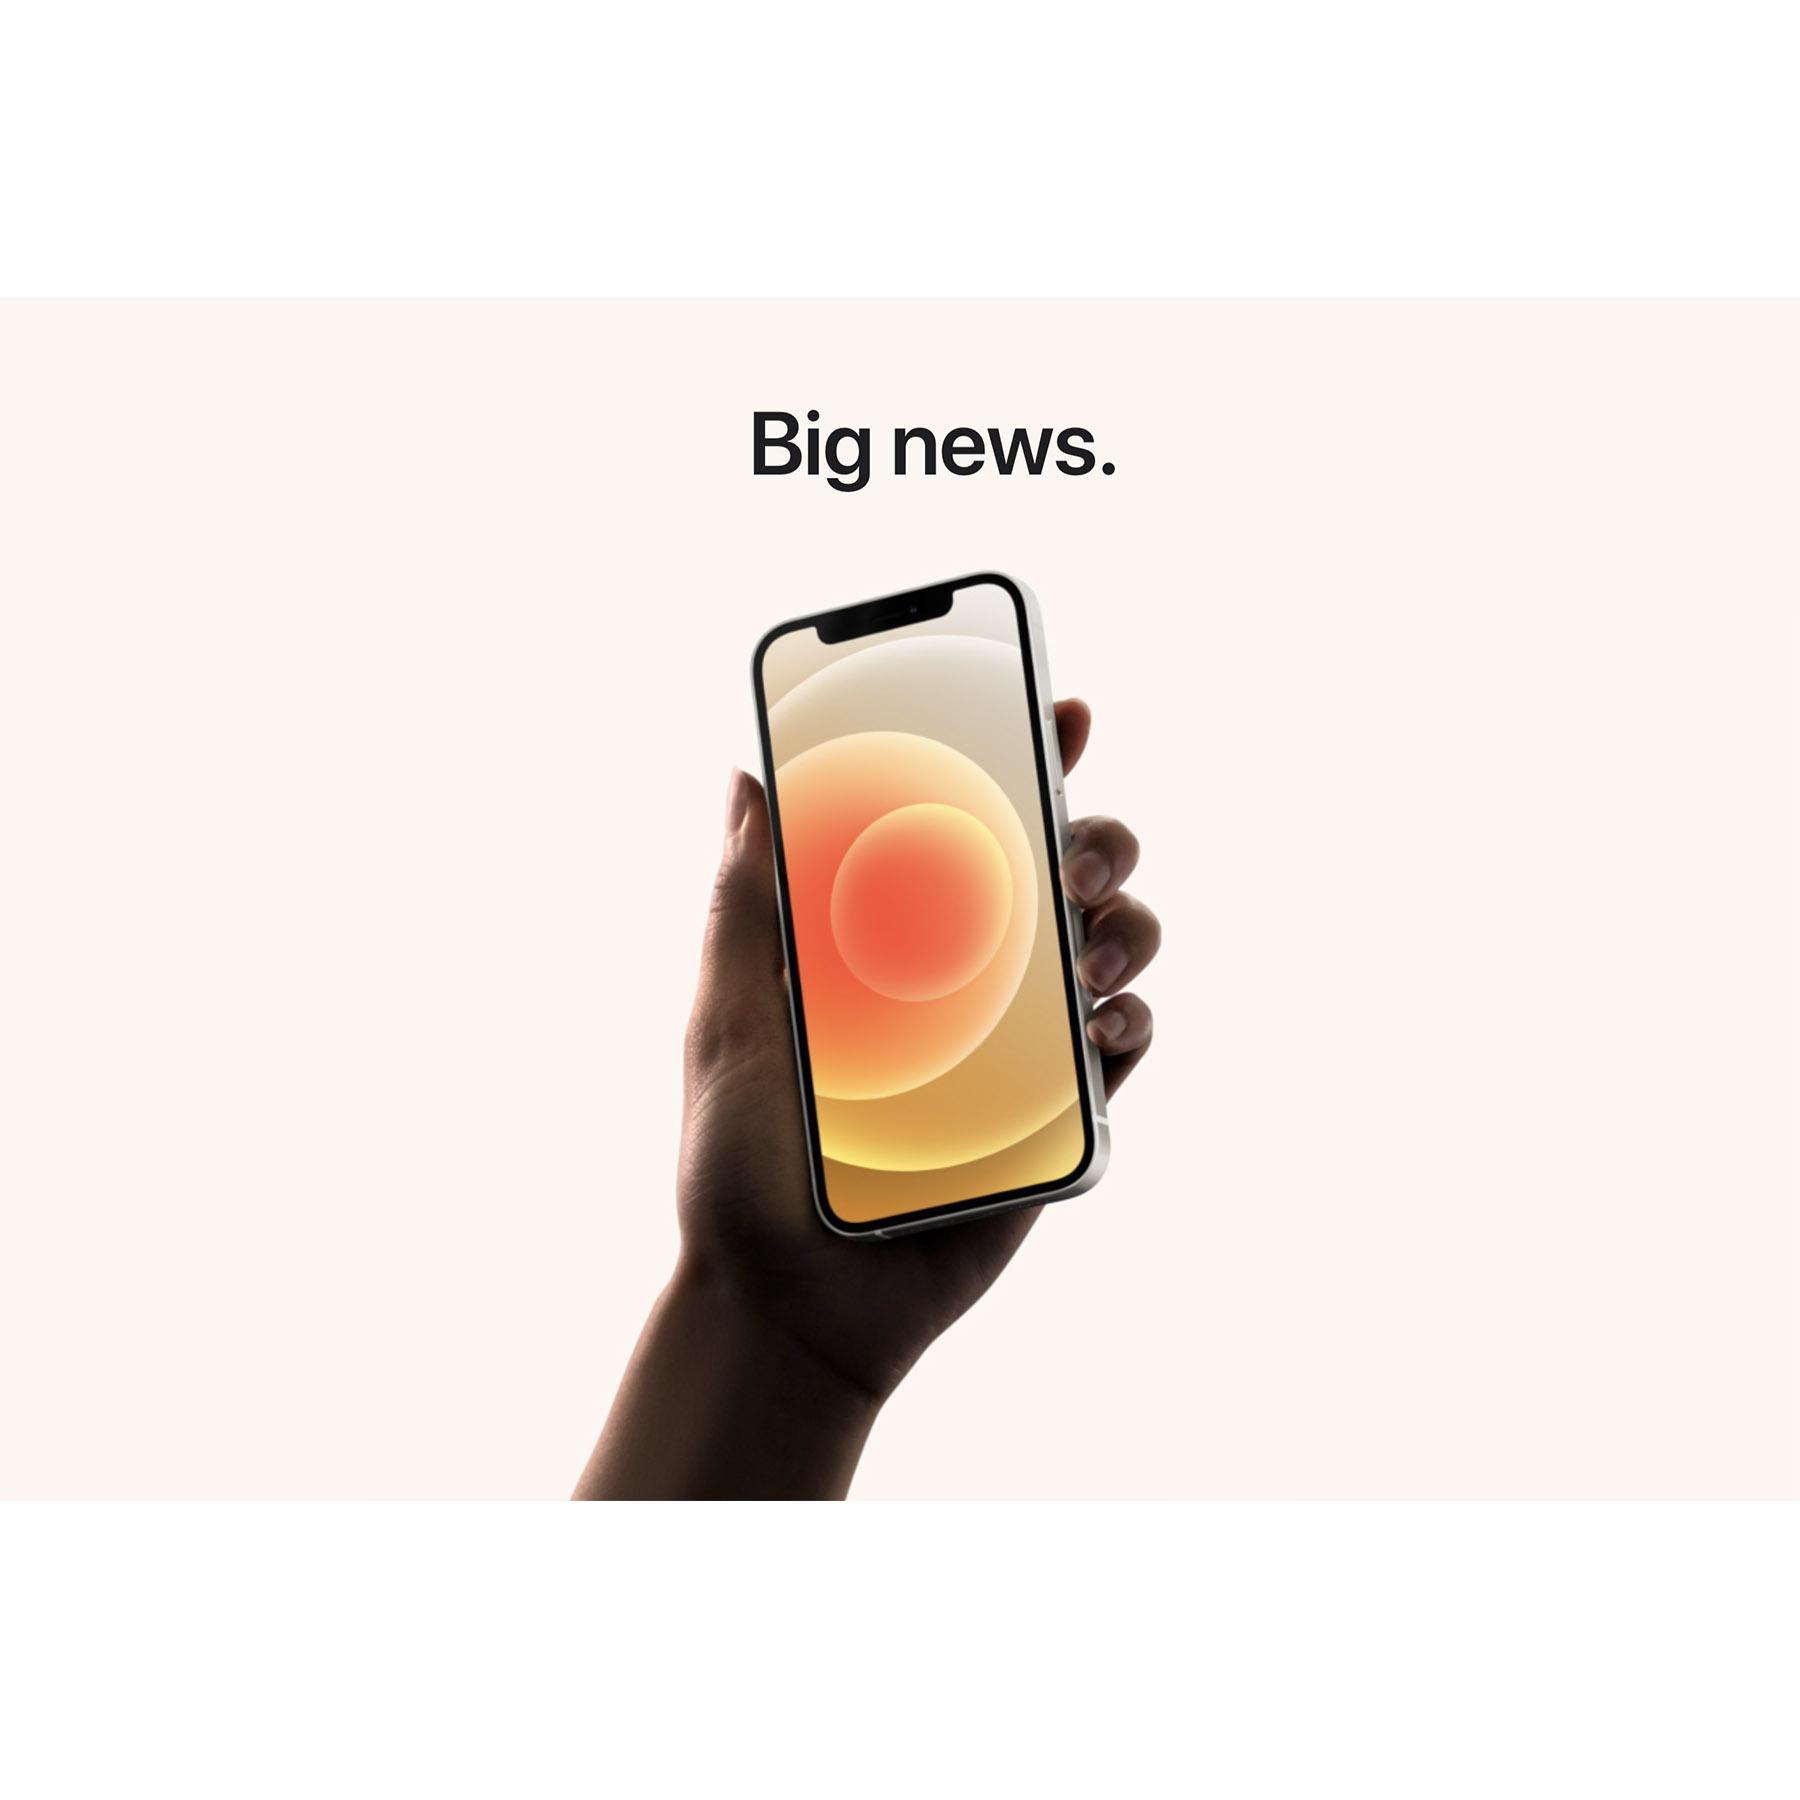 گوشی موبایل اپل مدل iPhone 12 A2404 دو سیم کارت ظرفیت 256 گیگابایت  main 1 16